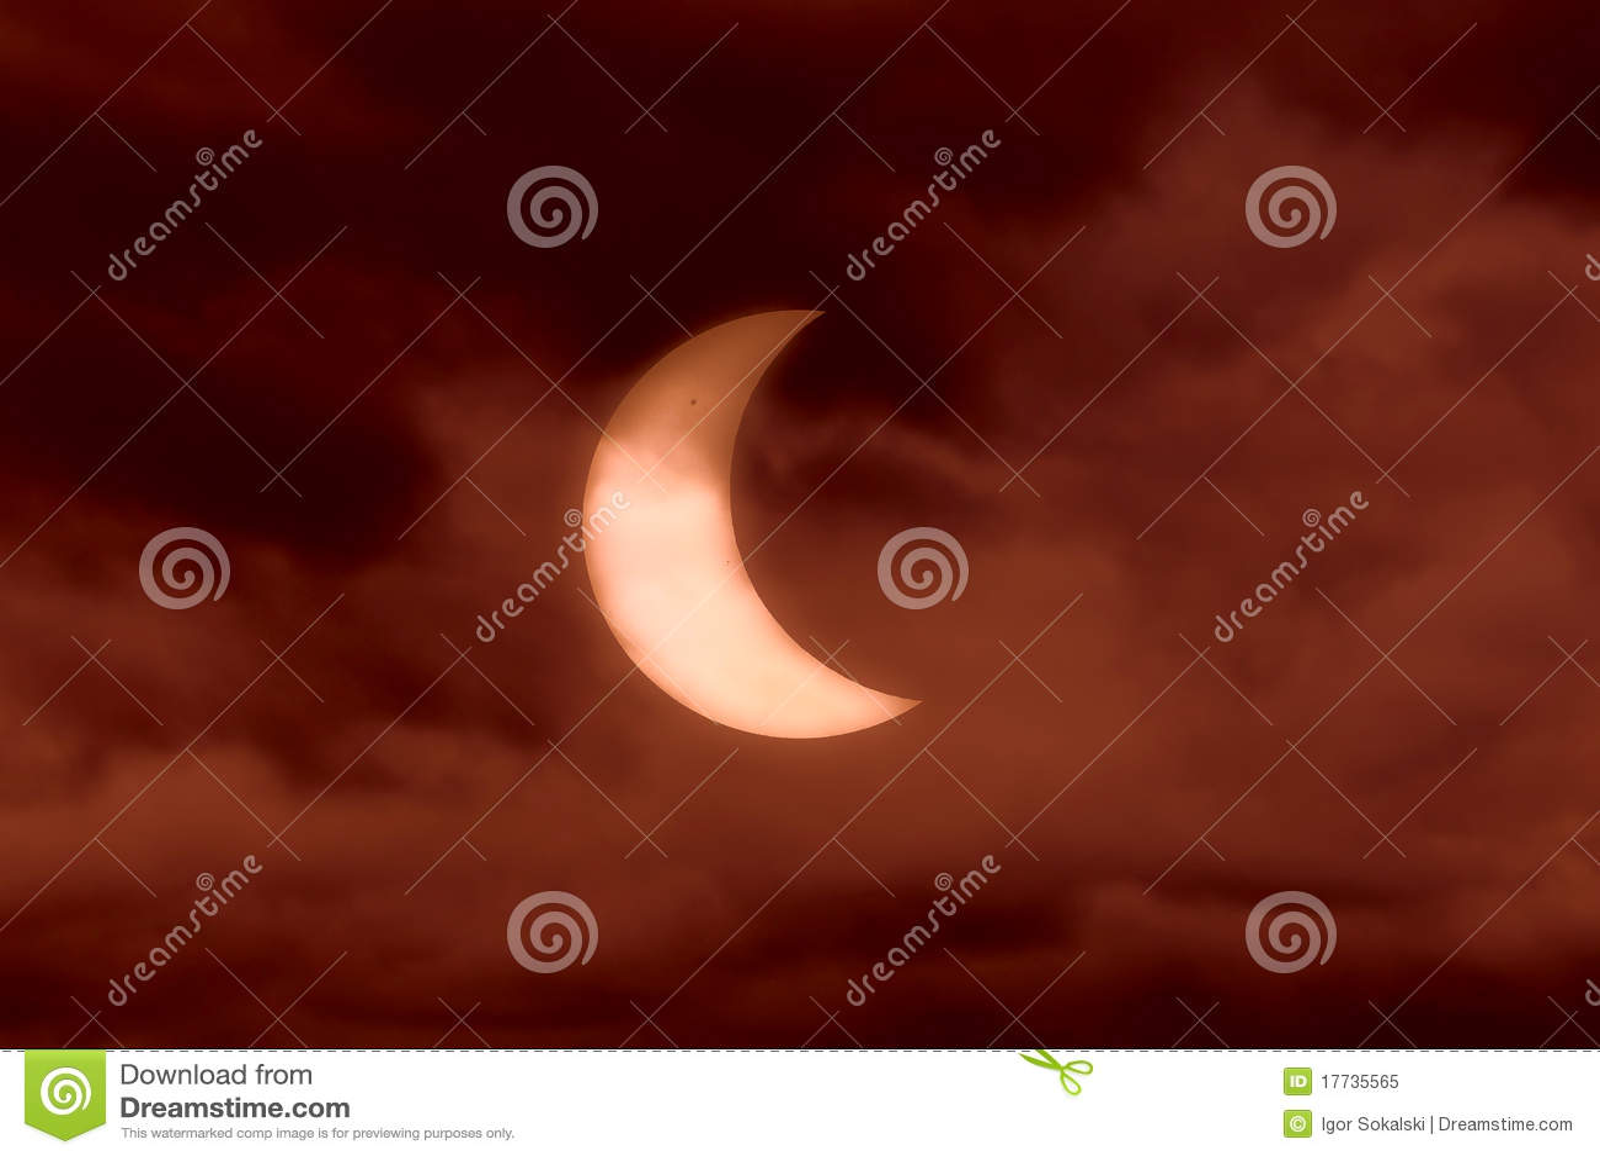 1492 eclipse solar: